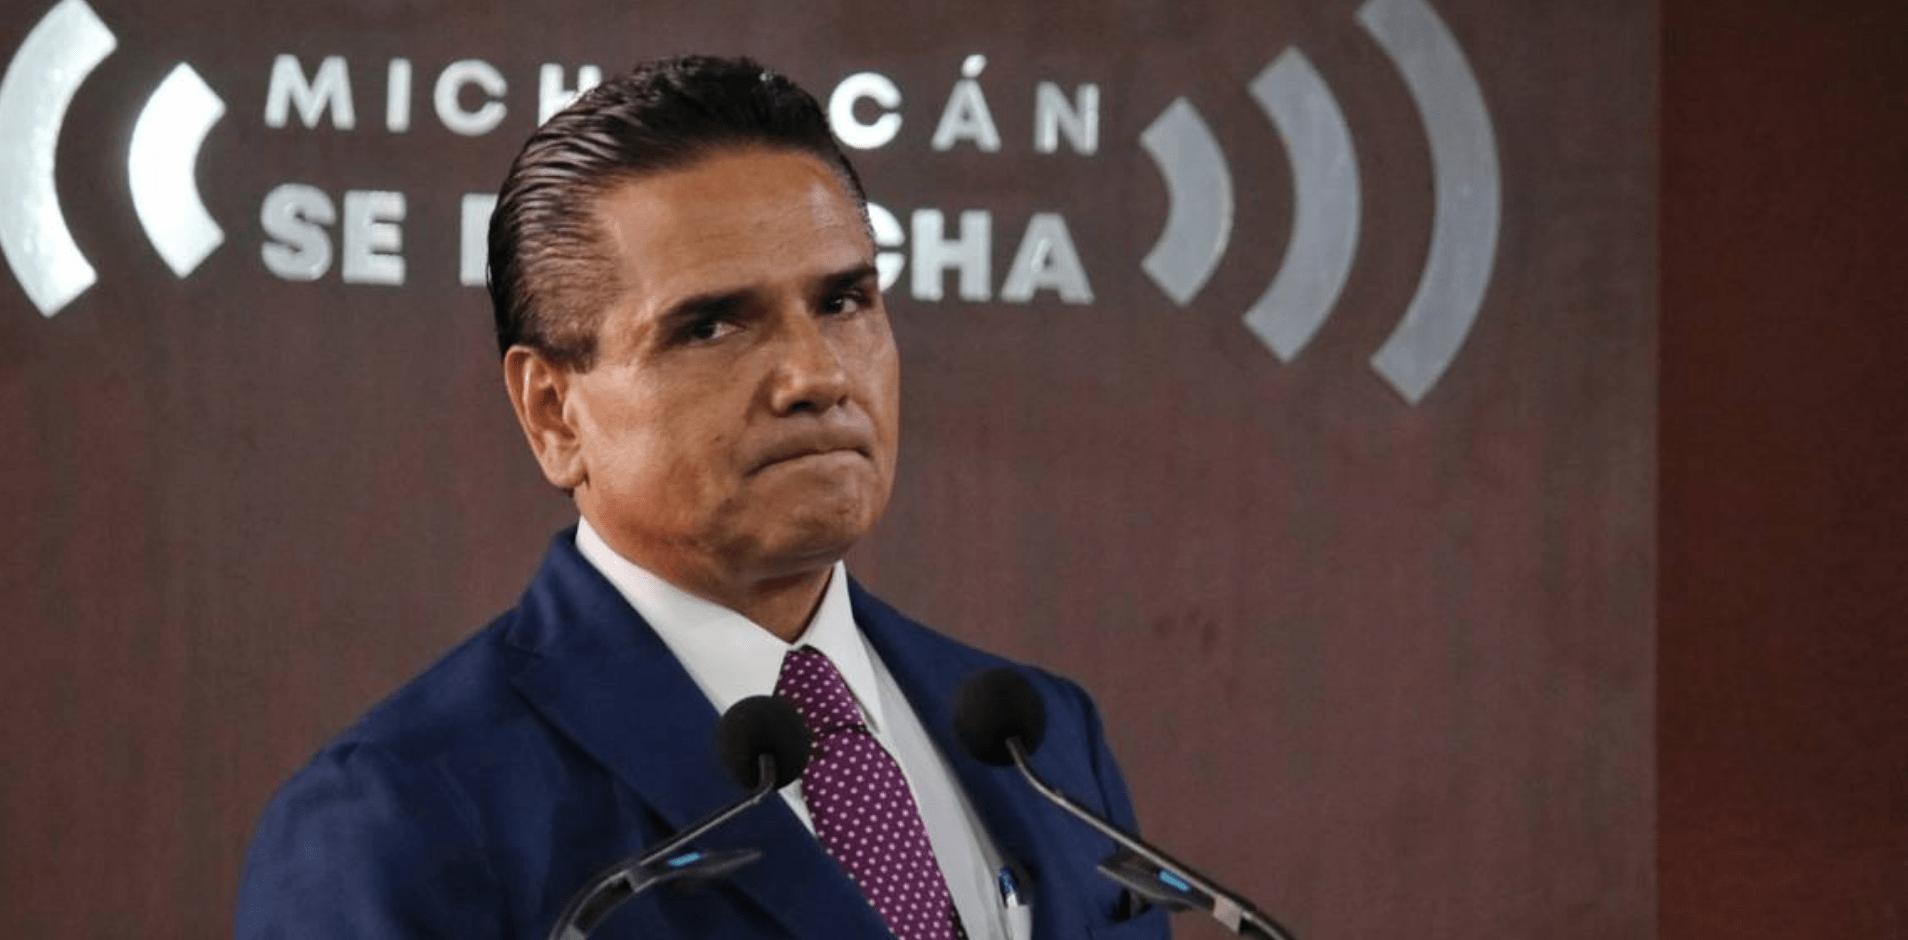 Silvano, Aureoles, Michoacán, Gobierno, Candidato, Hermano, Carnal, Prd, PAN, PRI, Morena, Morelia, Michoacán,